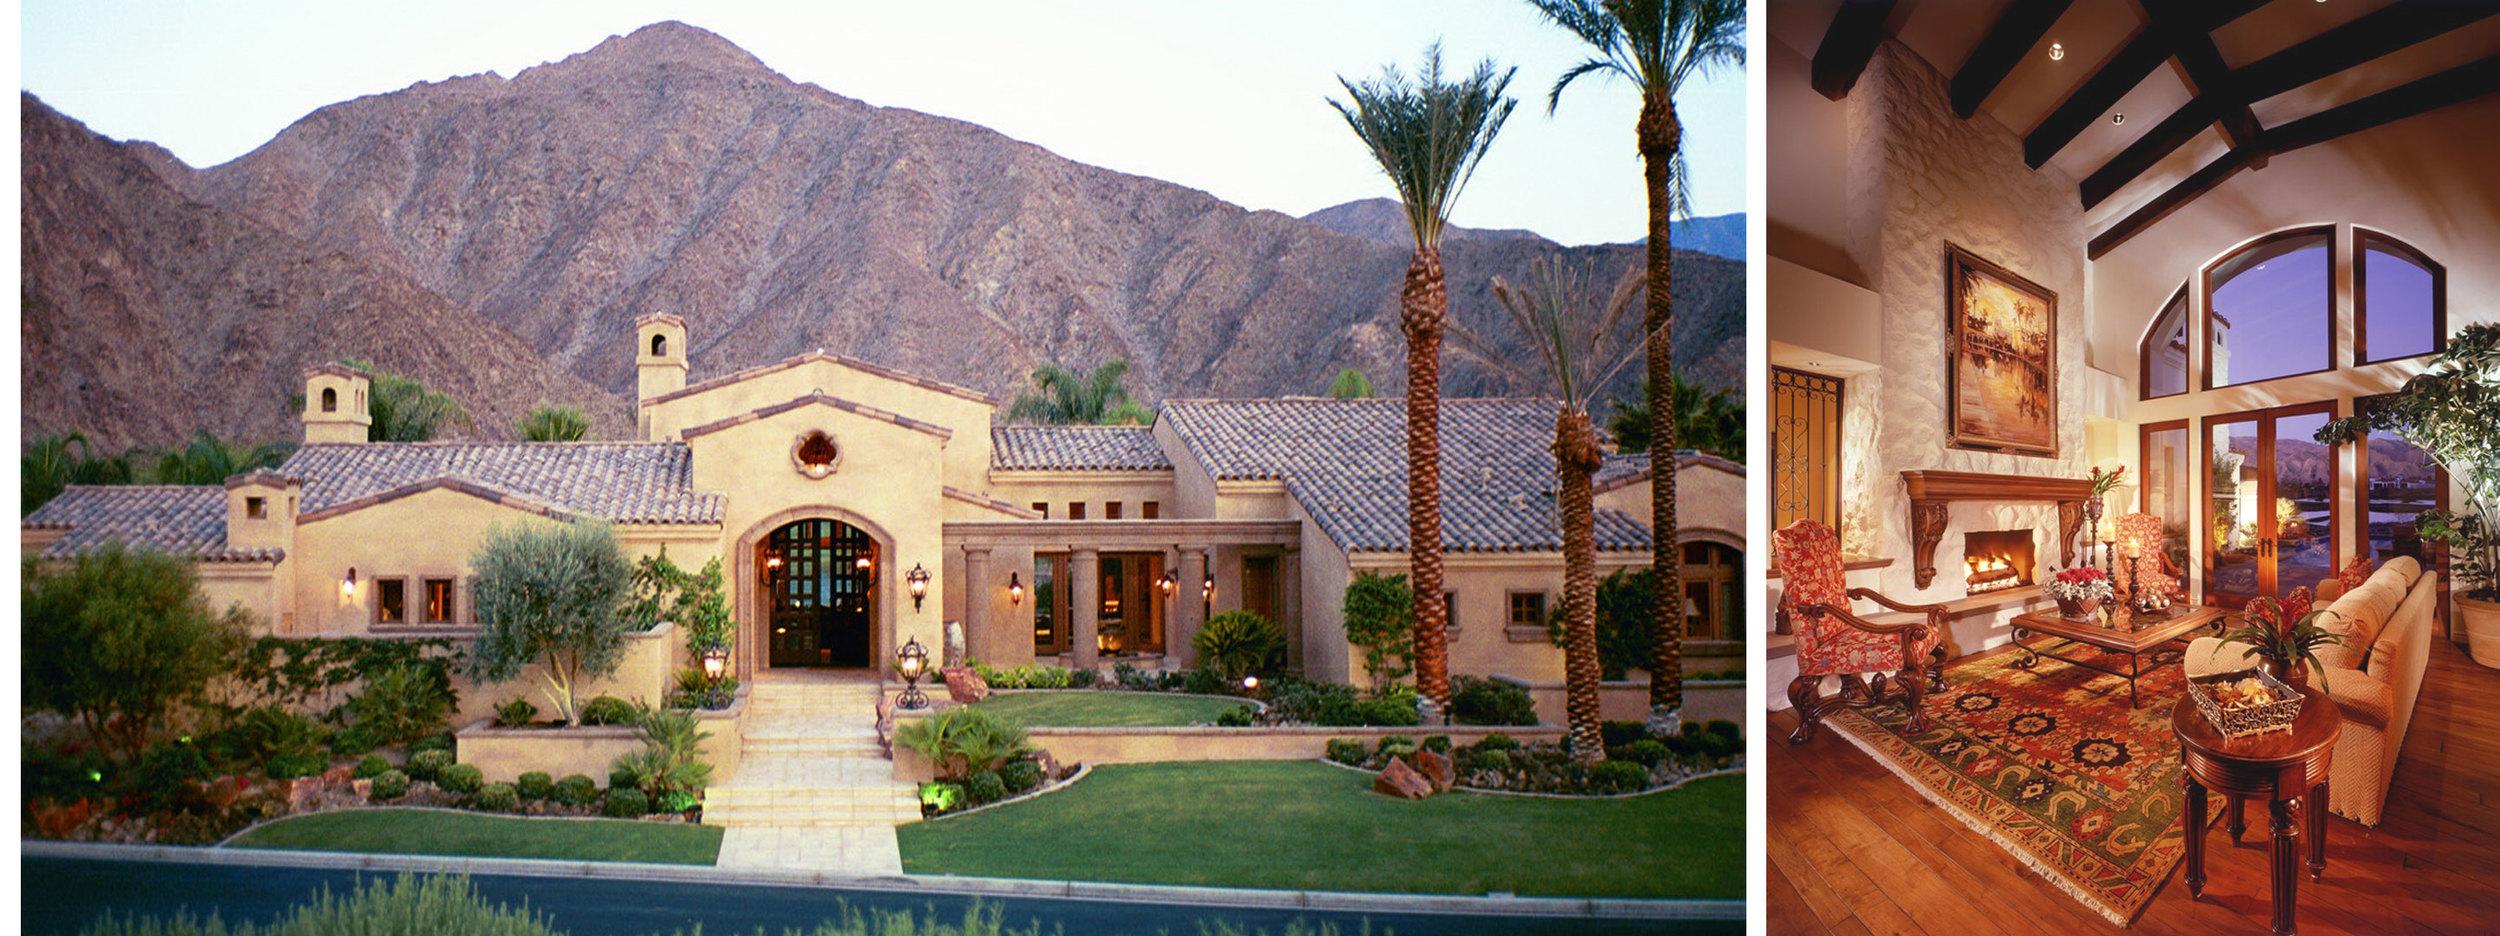 La-Quinta-Palm-Springs-2.jpg